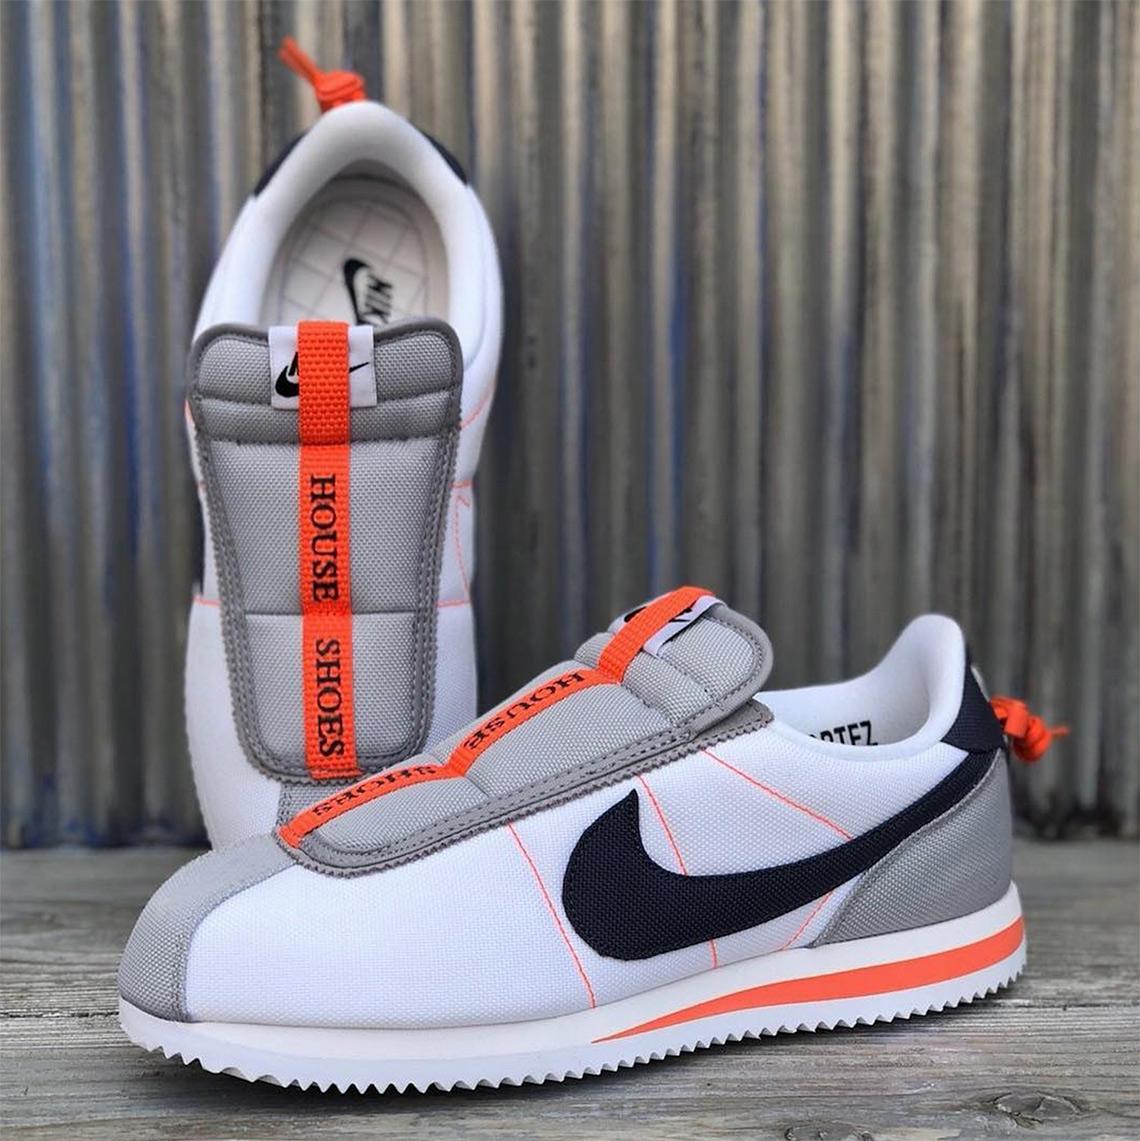 Kendrick Lamar Nike Cortez AV2950-100